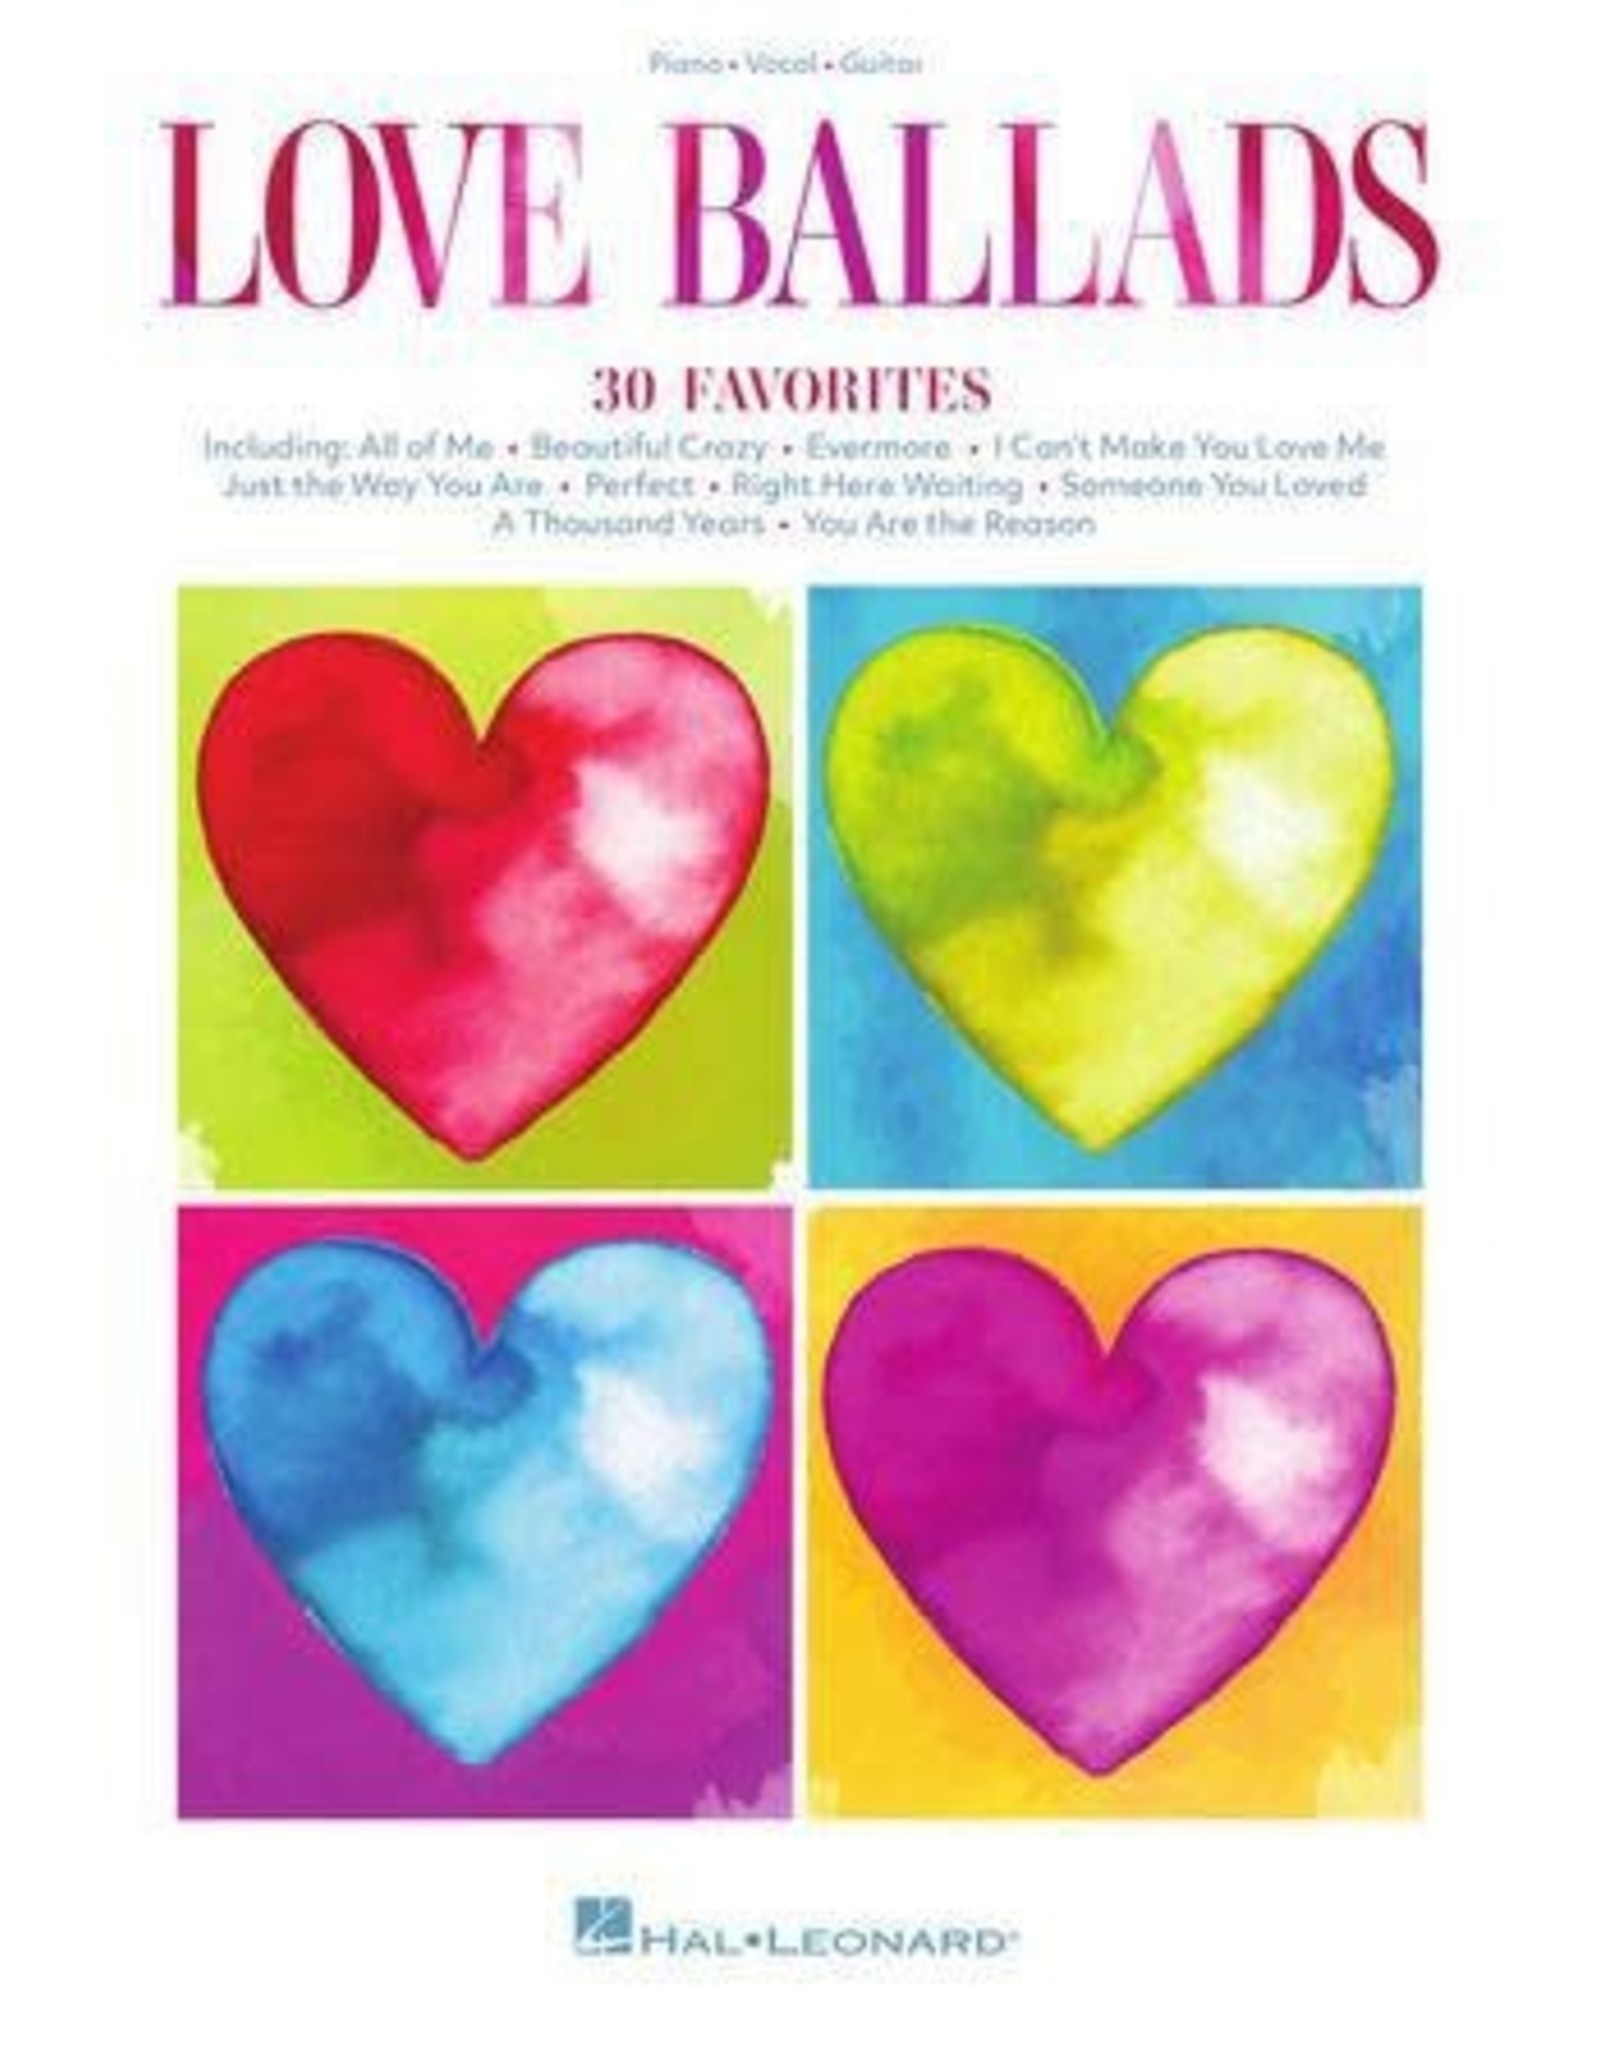 Hal Leonard Love Ballads - 30 Heart-Warming Favorites PVG